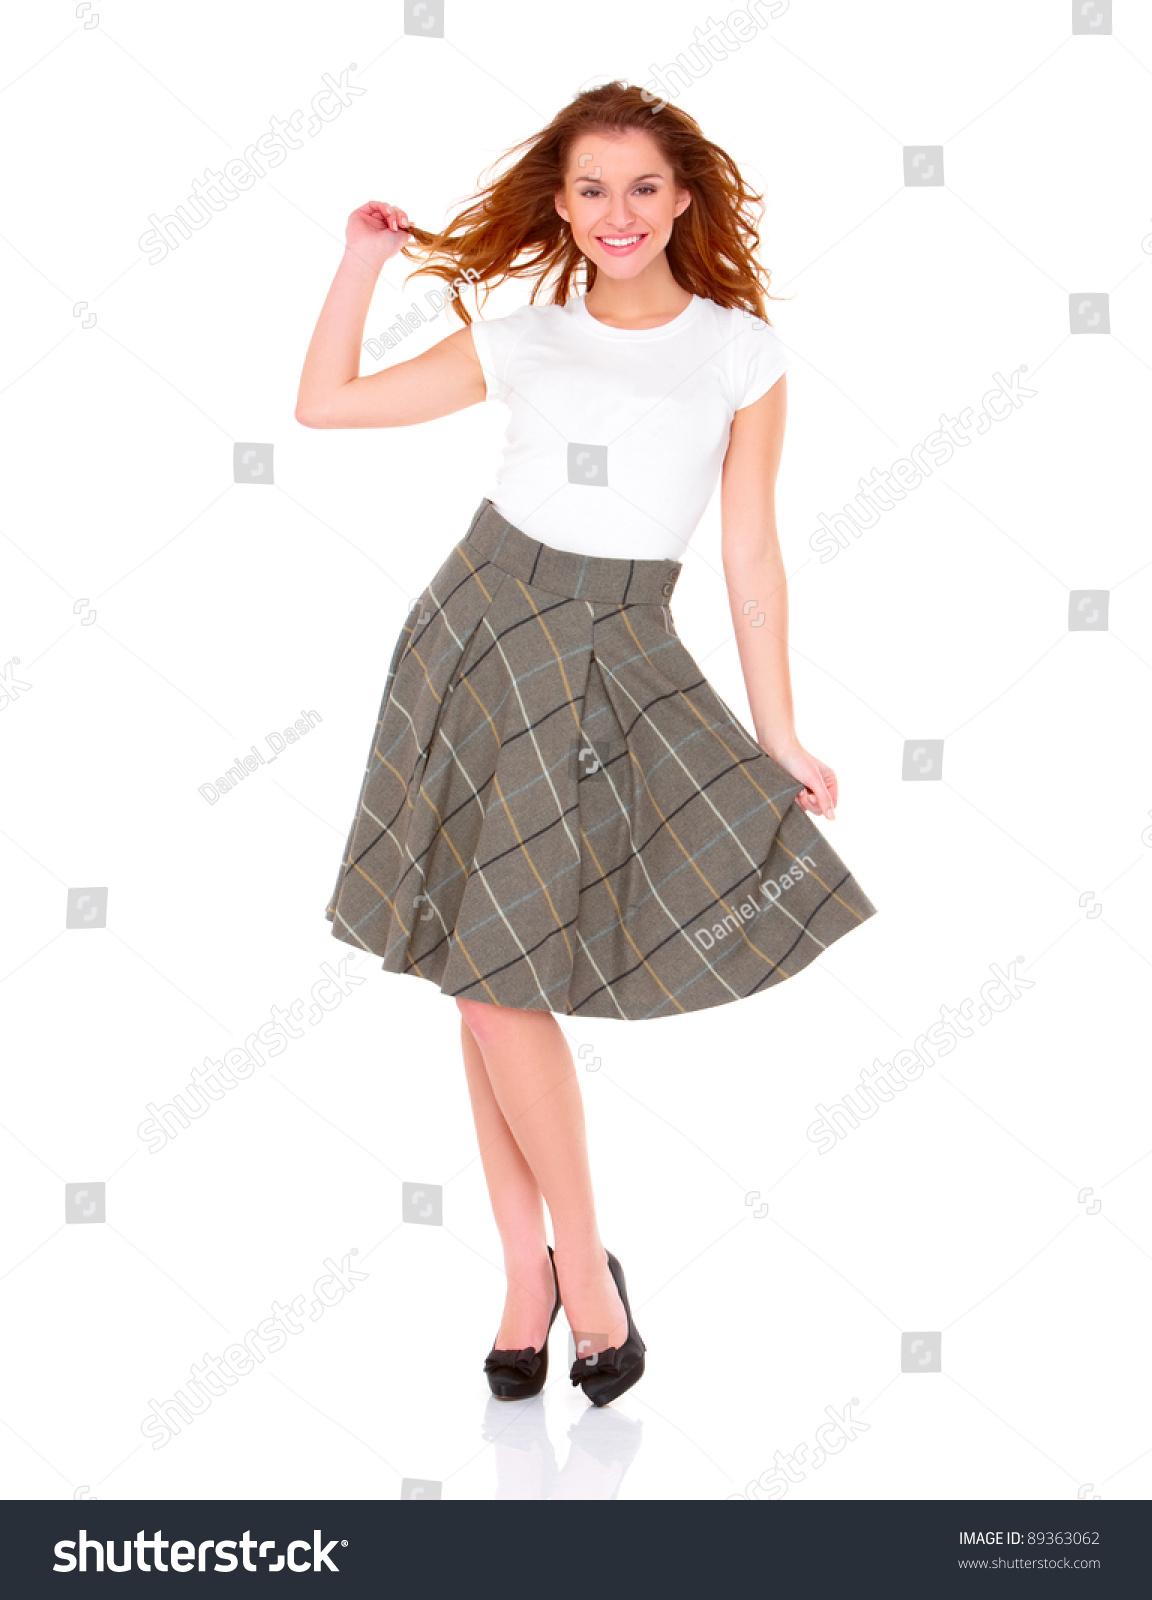 Beautiful Young Woman Wearing Skirt On Stock Photo 89363062 ...